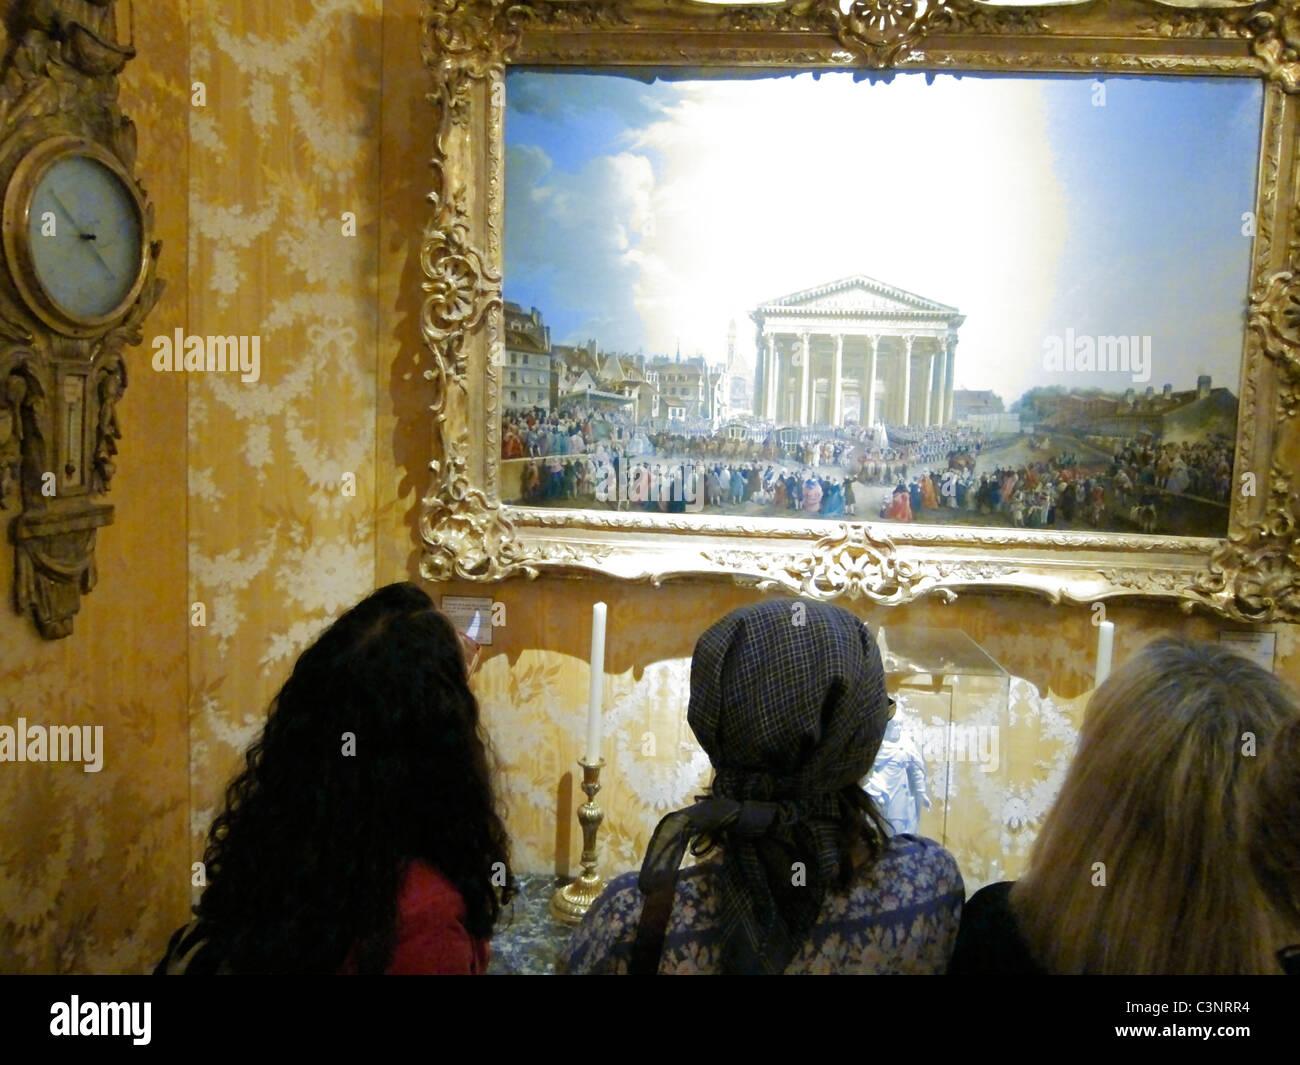 Paris, France, People Visiting Looking 'Musee Carnavalet', 'Musee de l'Histoire', City of Paris - Stock Image